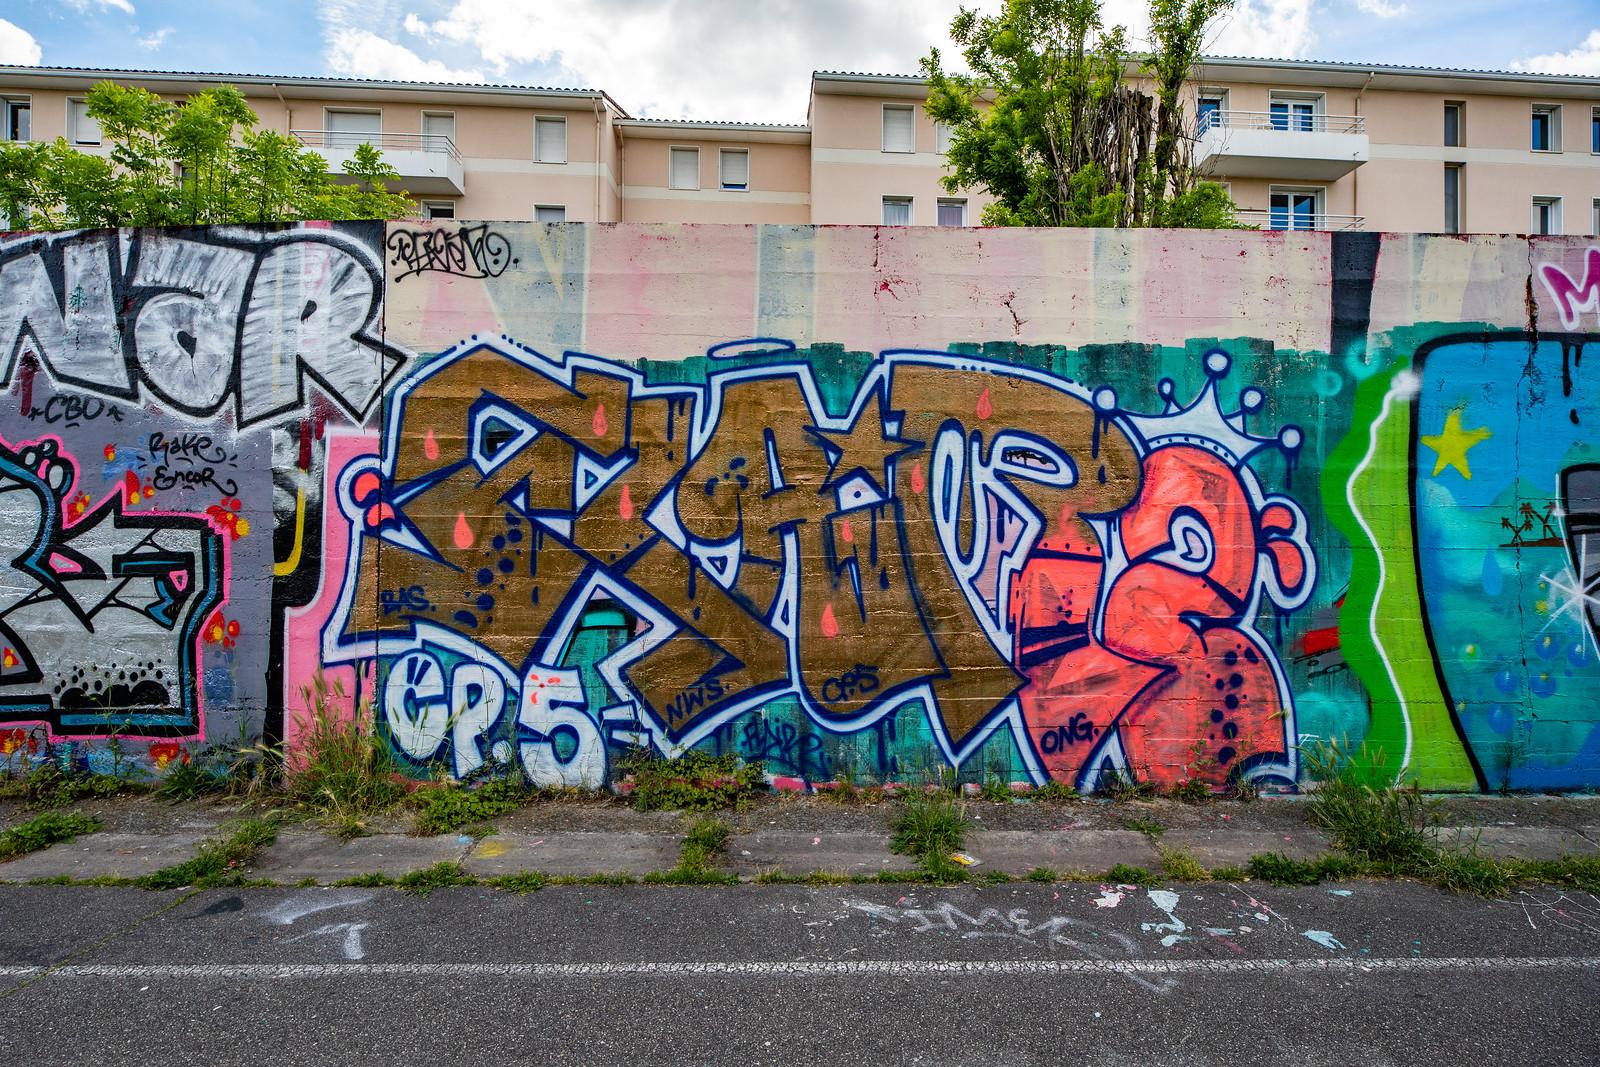 FLAIR2 ART GRAFFITI WALL